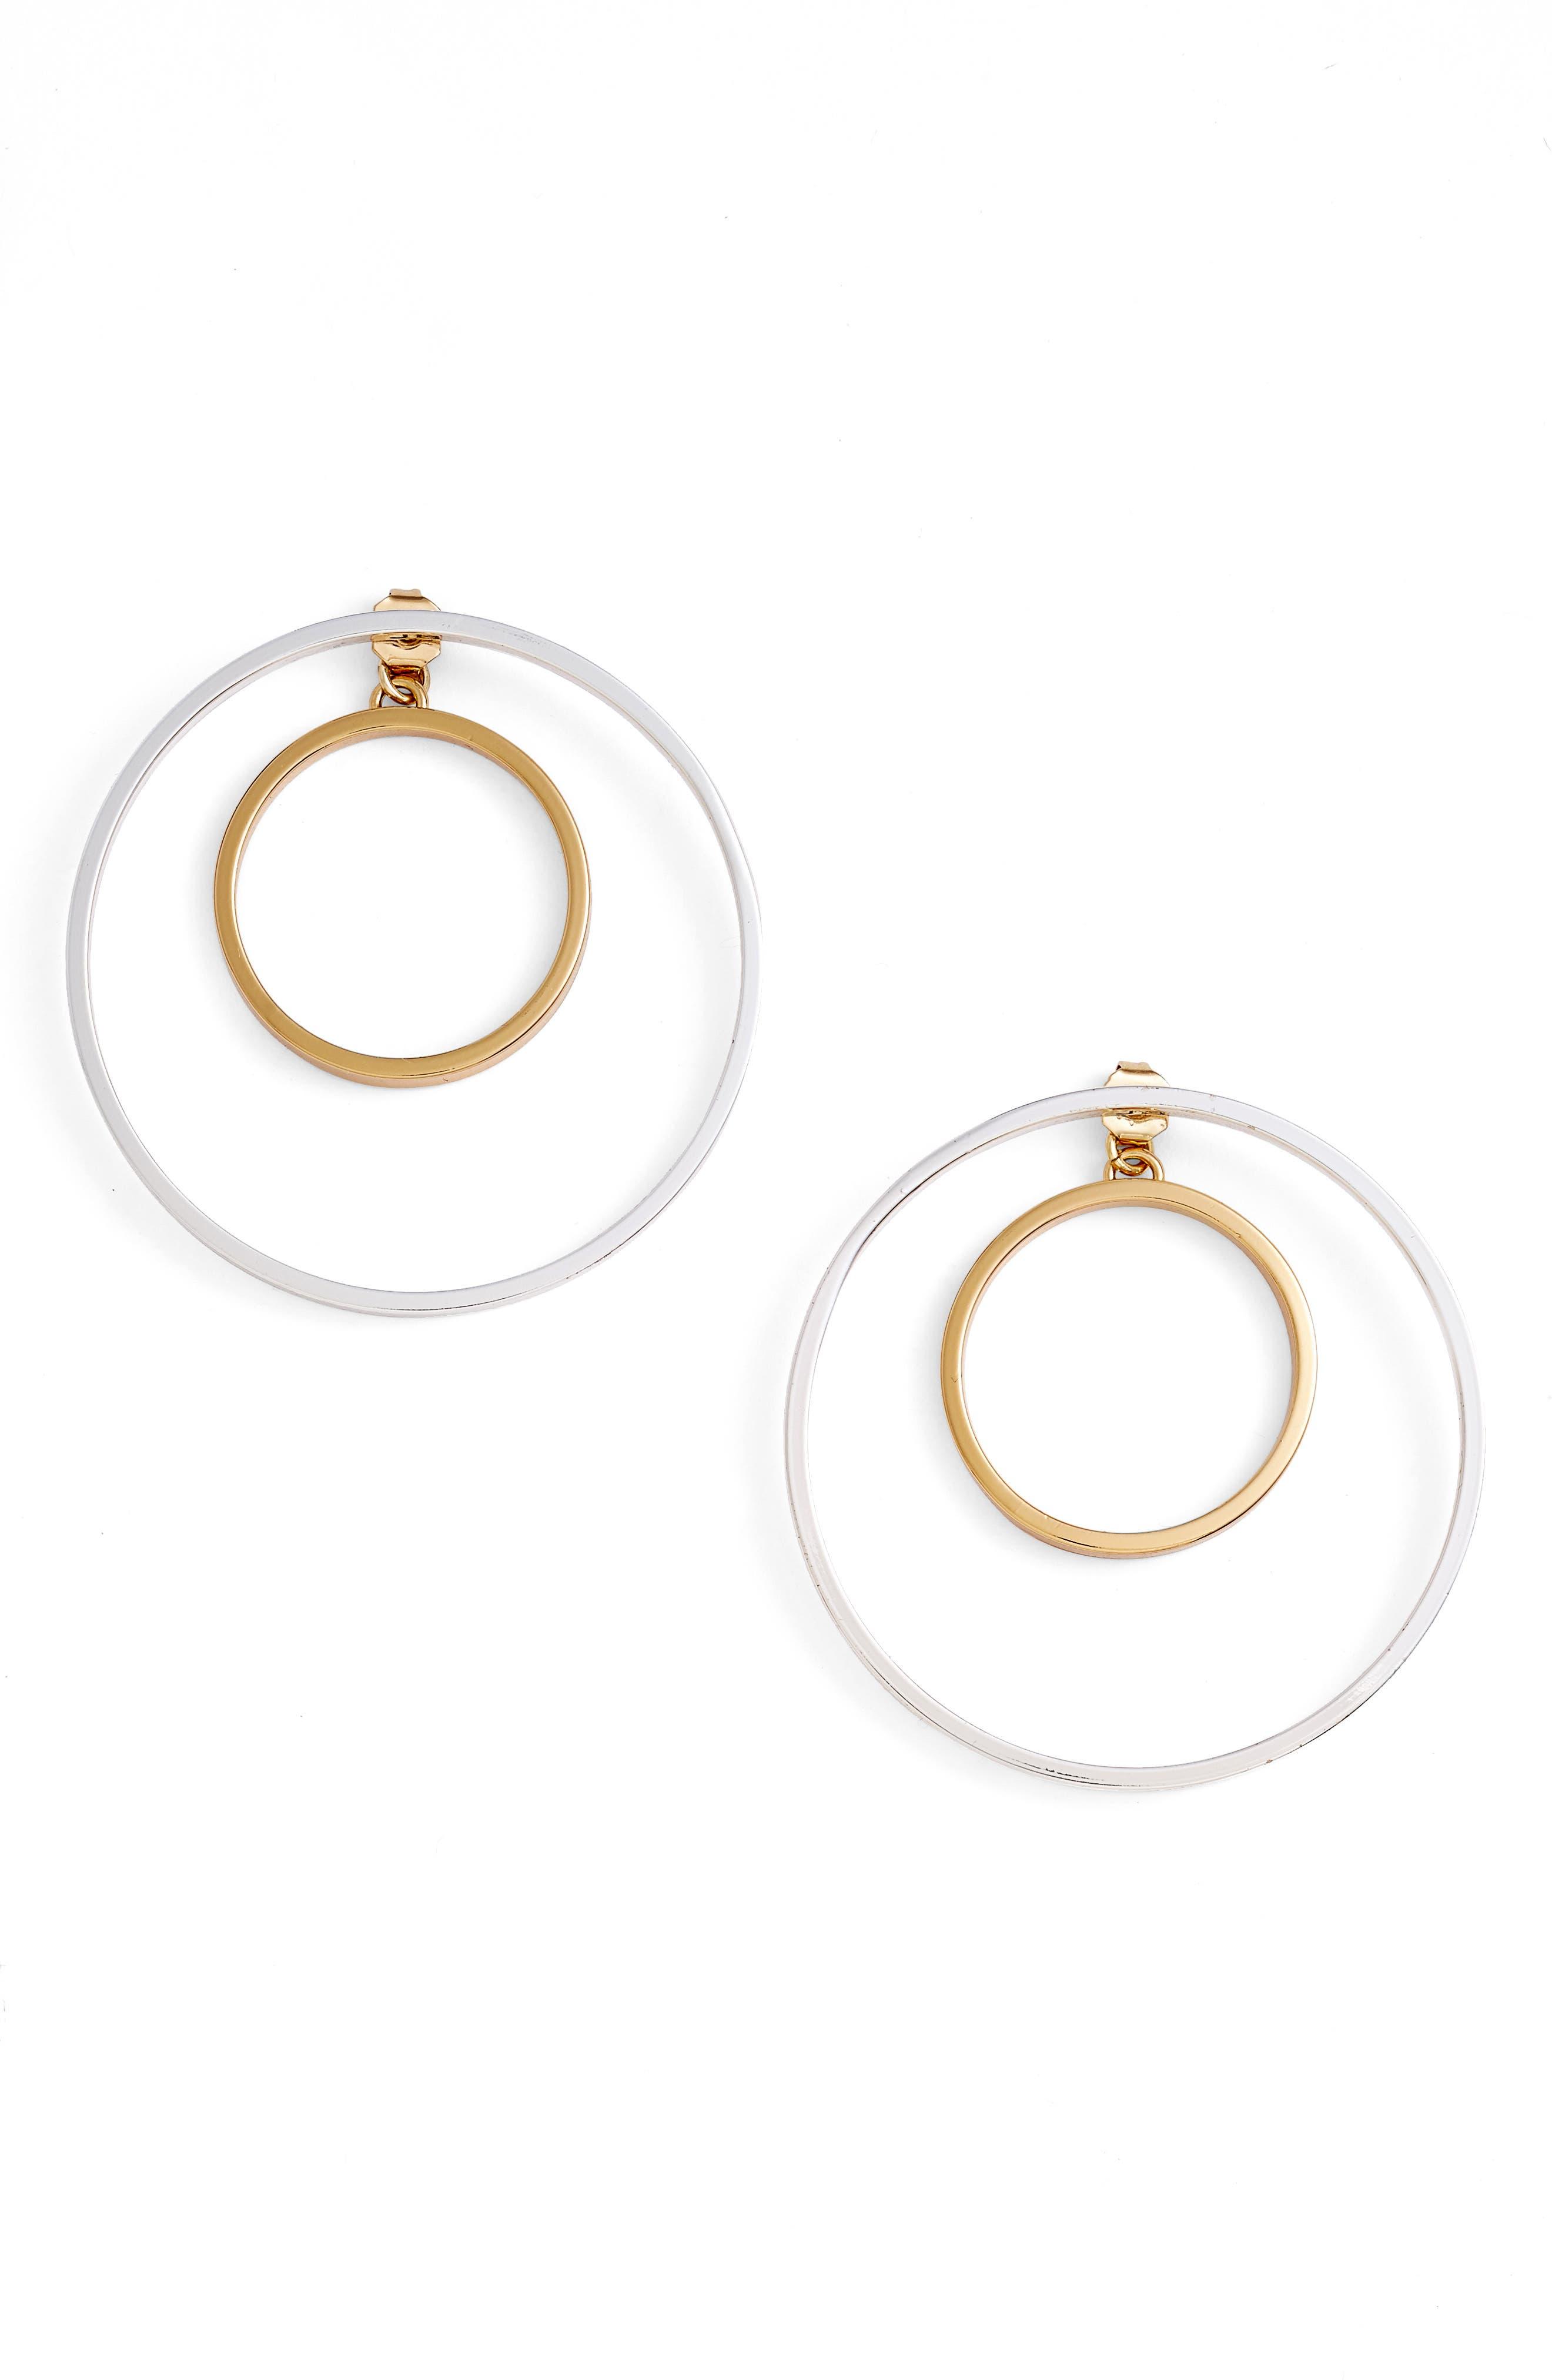 Rise Hoop Earrings,                         Main,                         color, TWO TONE